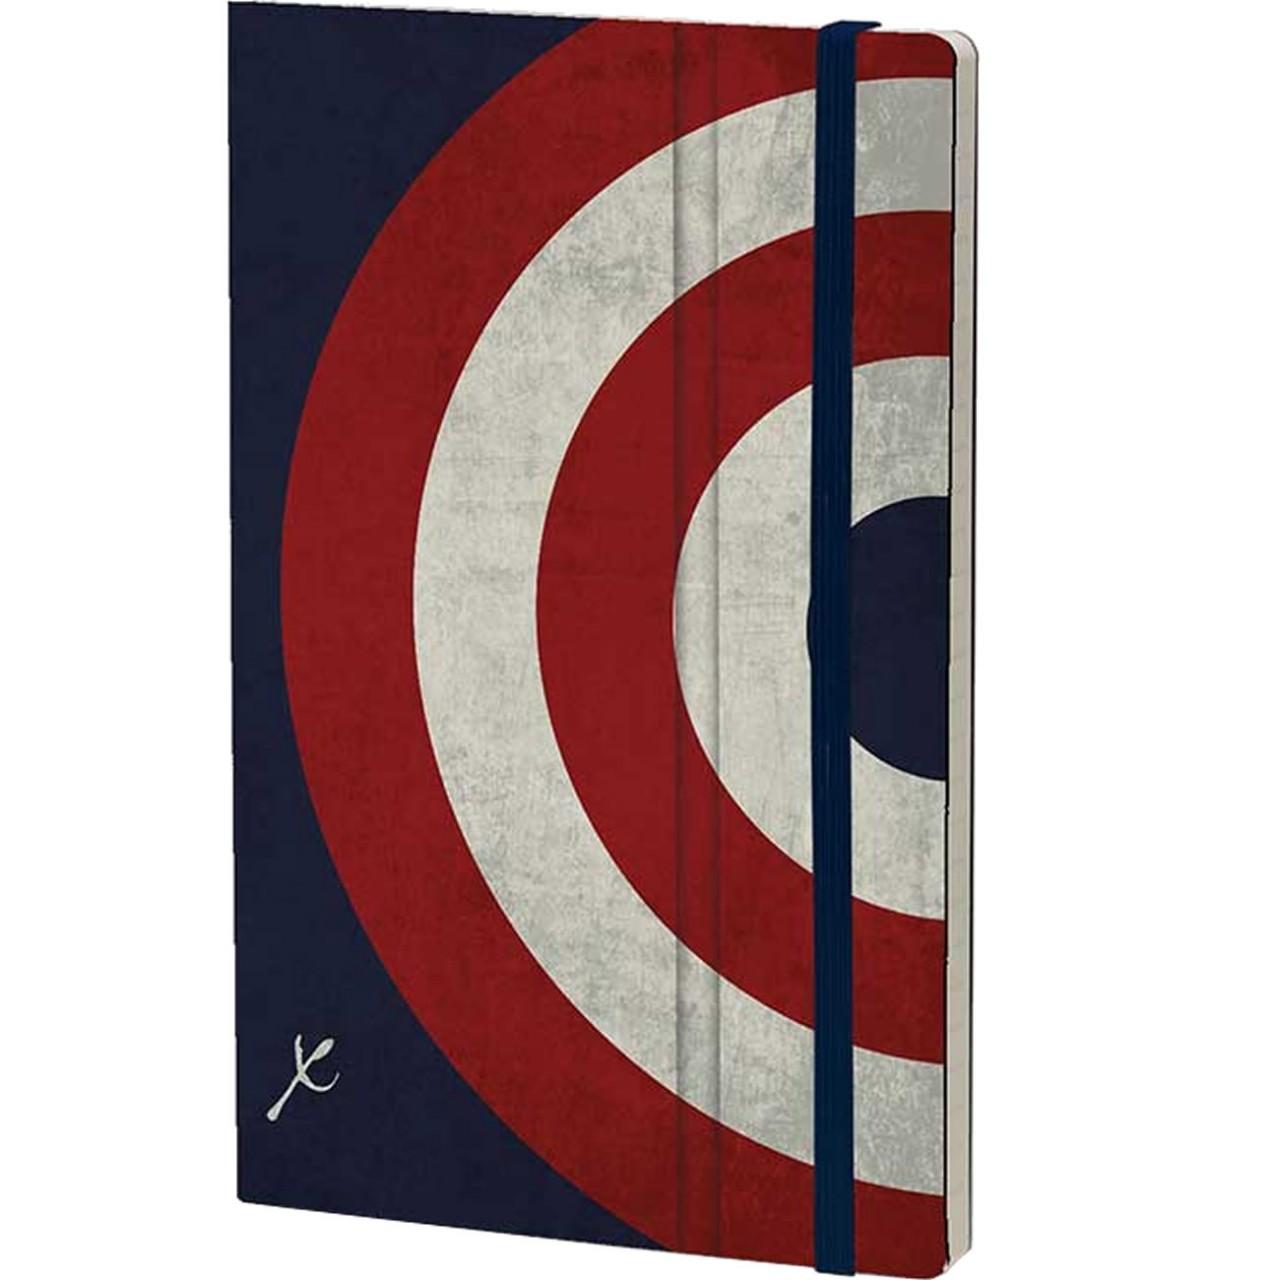 Stifflexible Notizbuch ICON 13 x 21 cm 192 S., CAPTAIN SHIELD